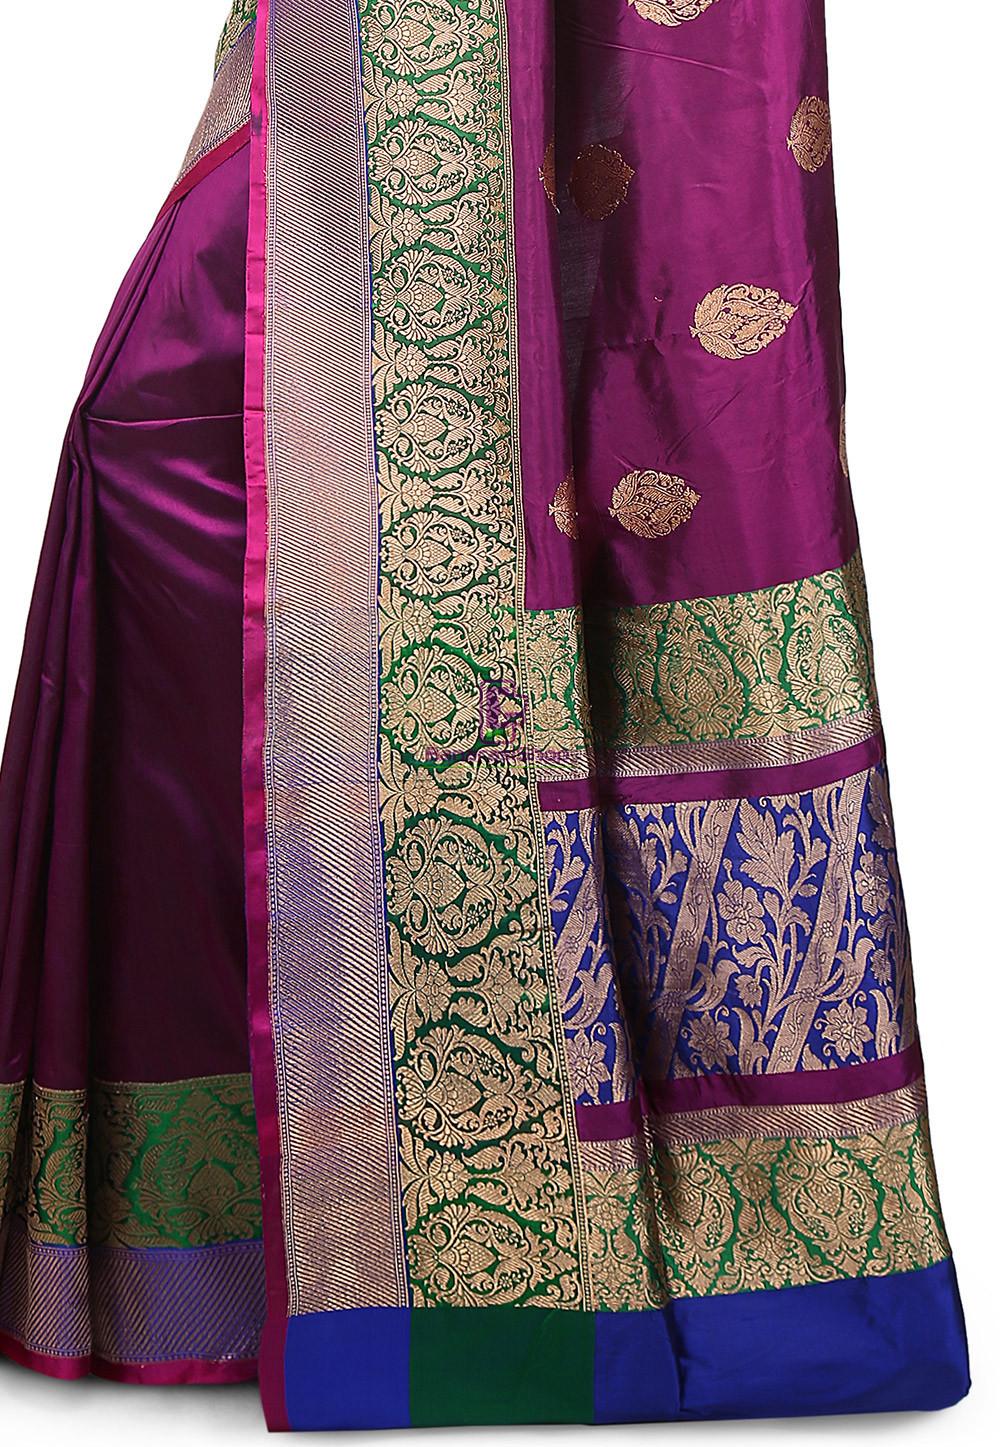 Banarasi Pure Katan Silk Handloom Saree in Purple 3